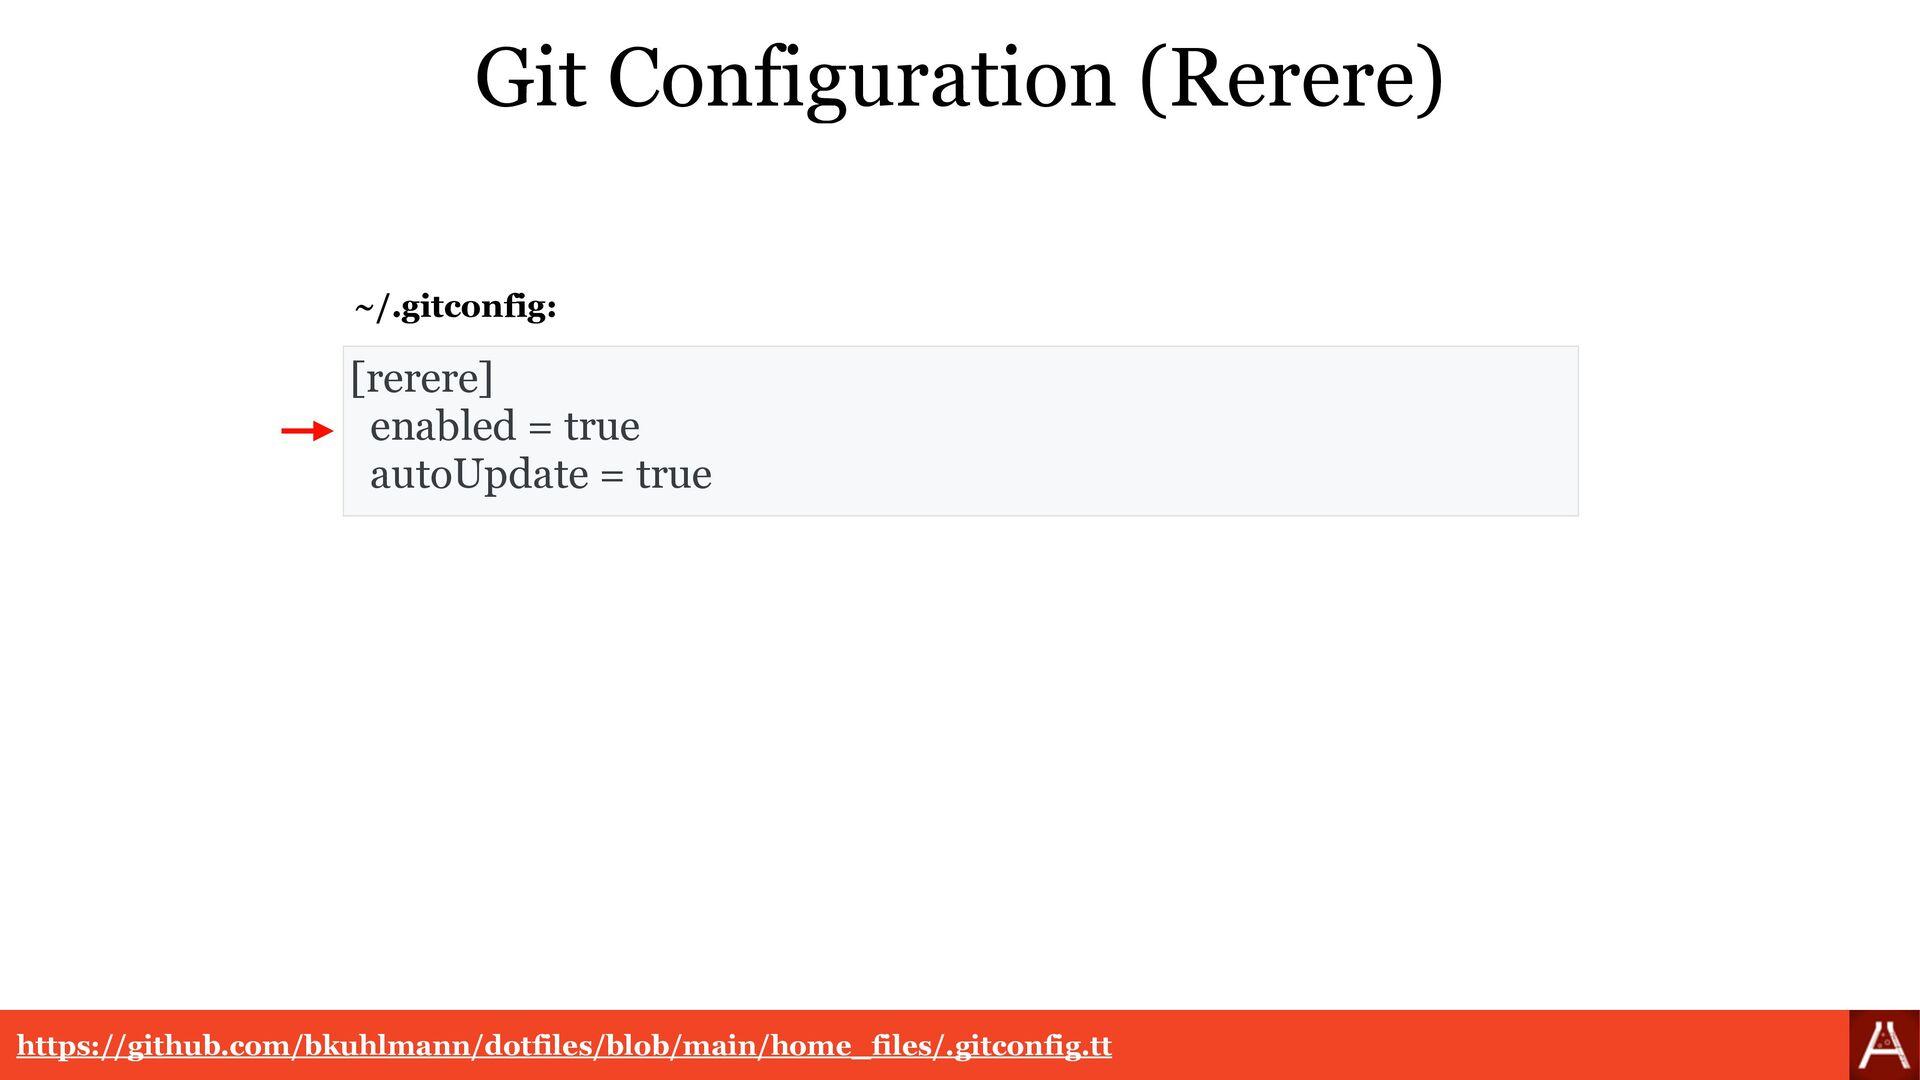 Articles https://www.alchemists.io/articles